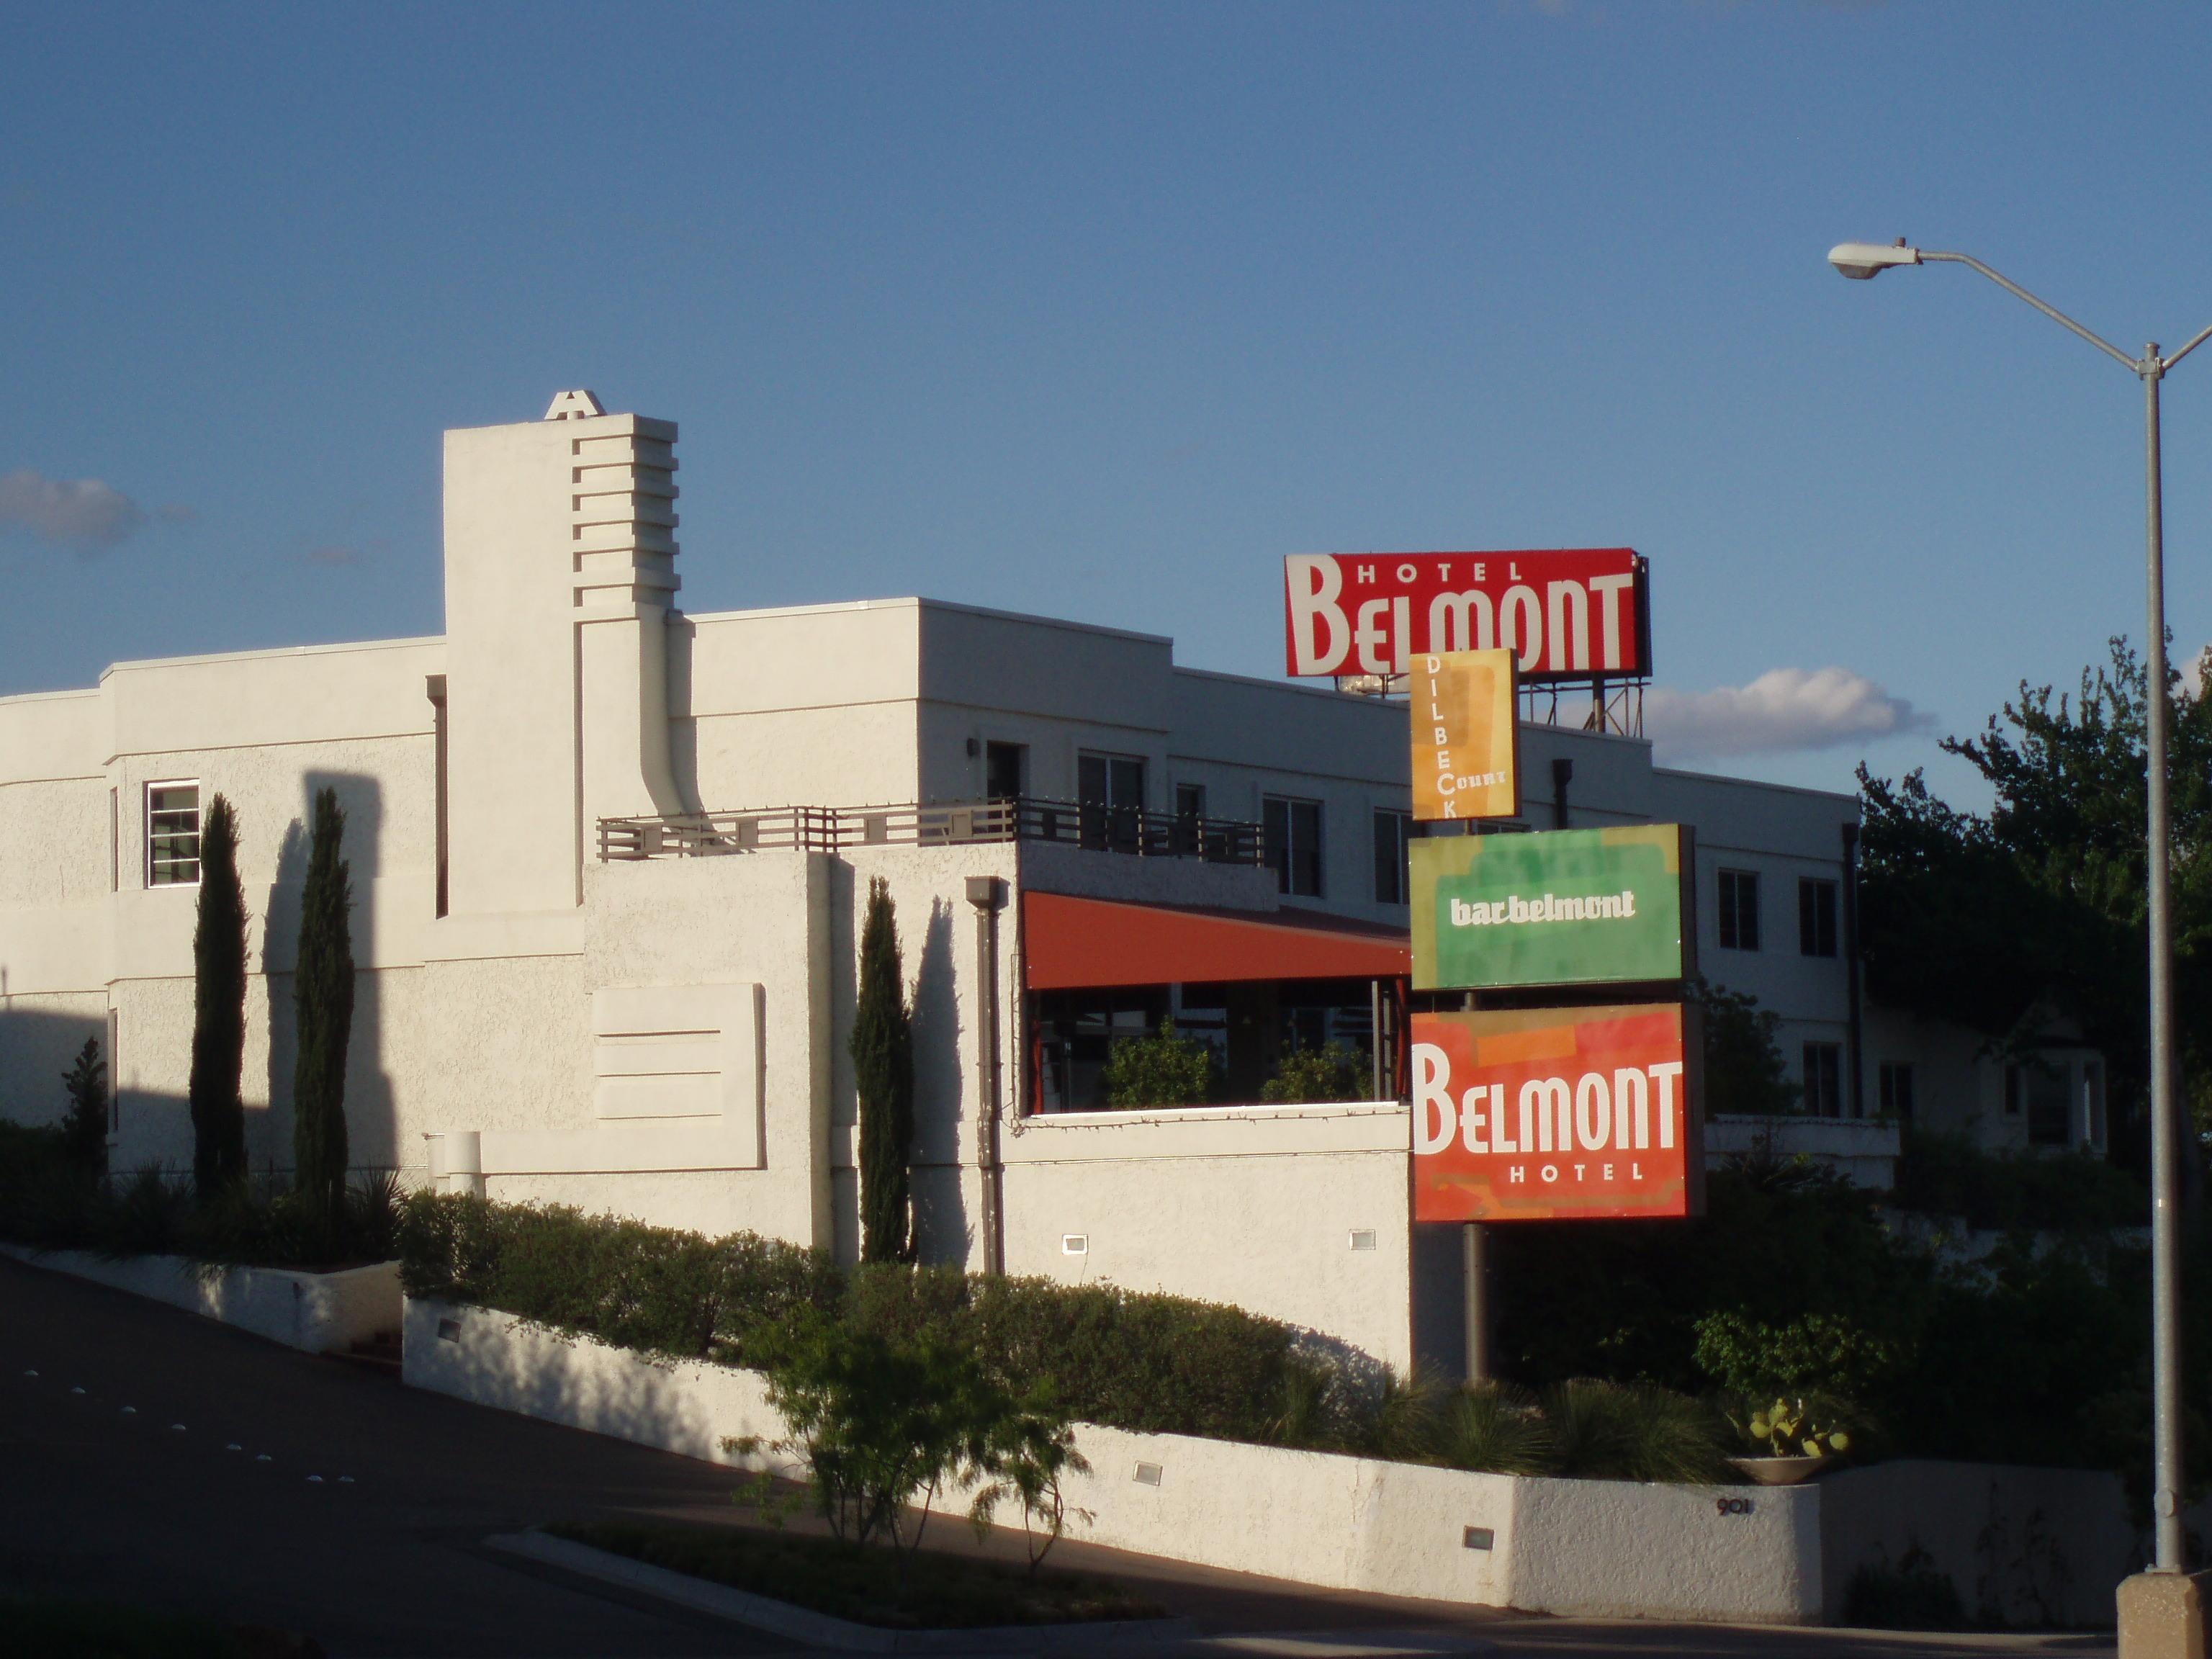 The Belmont Hotel